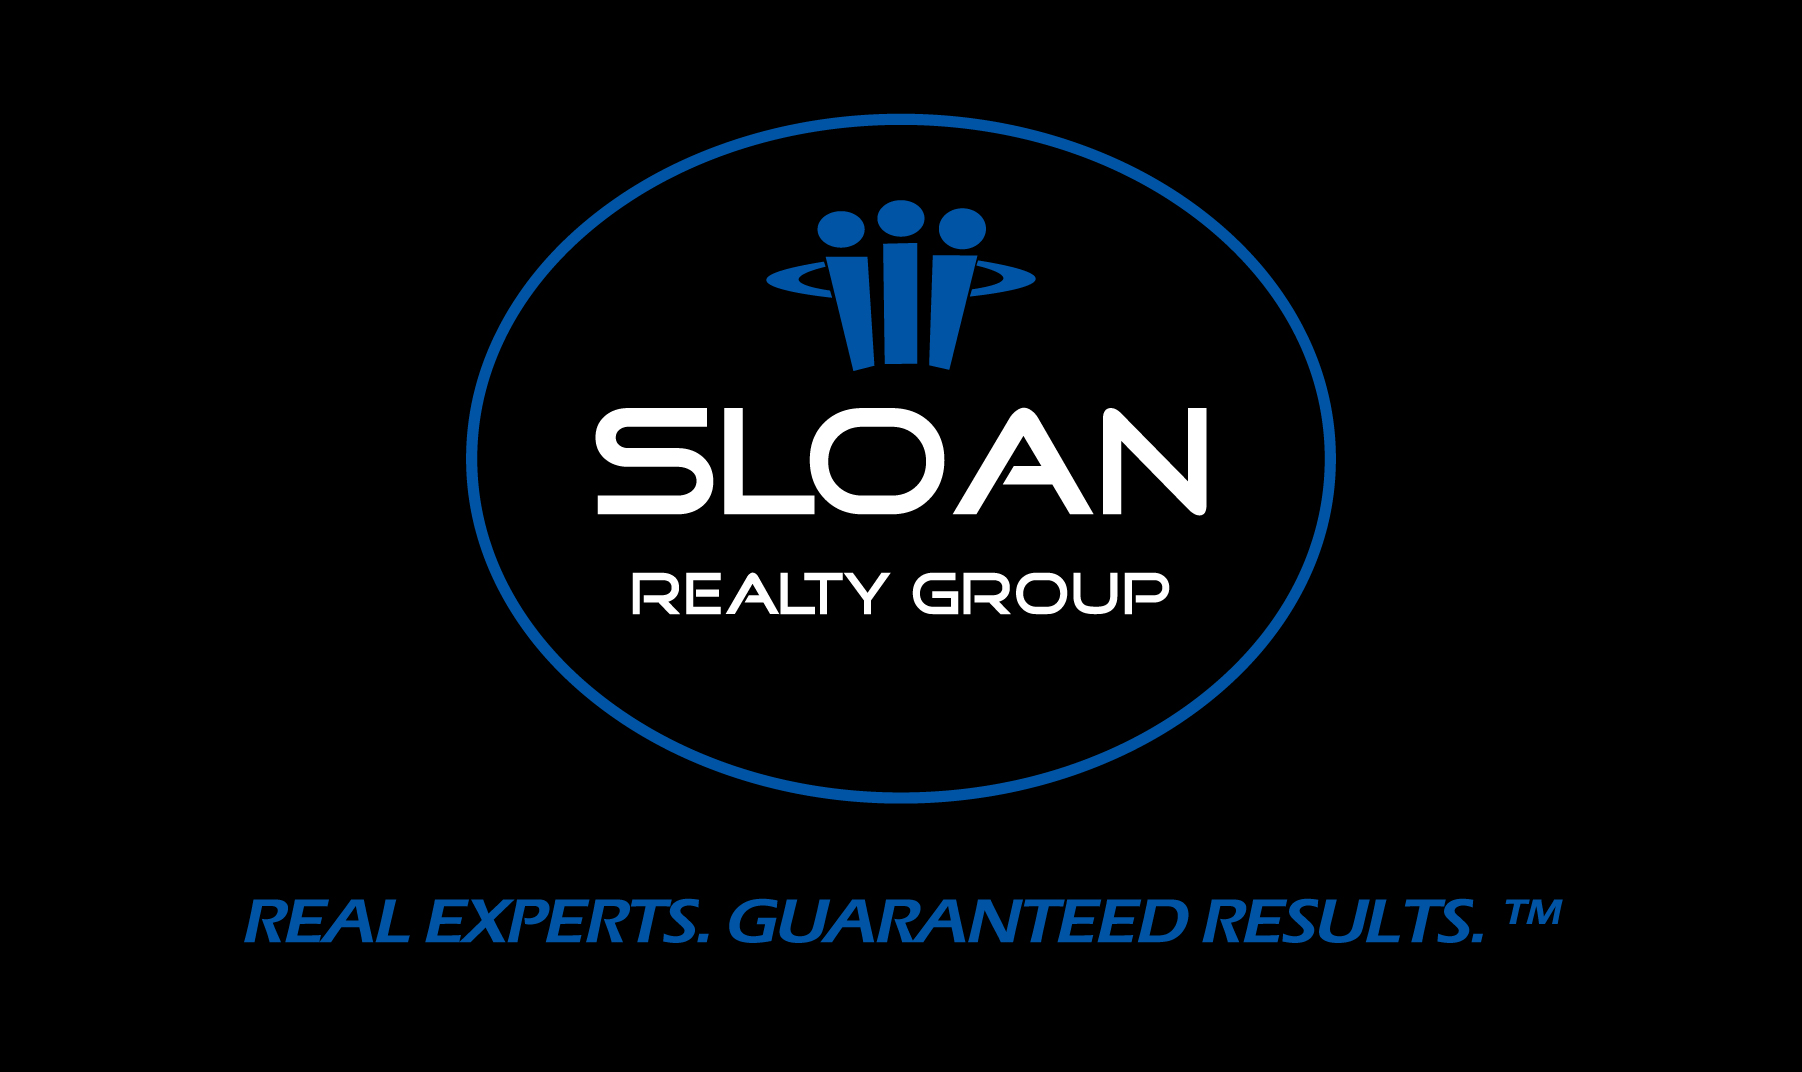 Sloan Realty Group logo